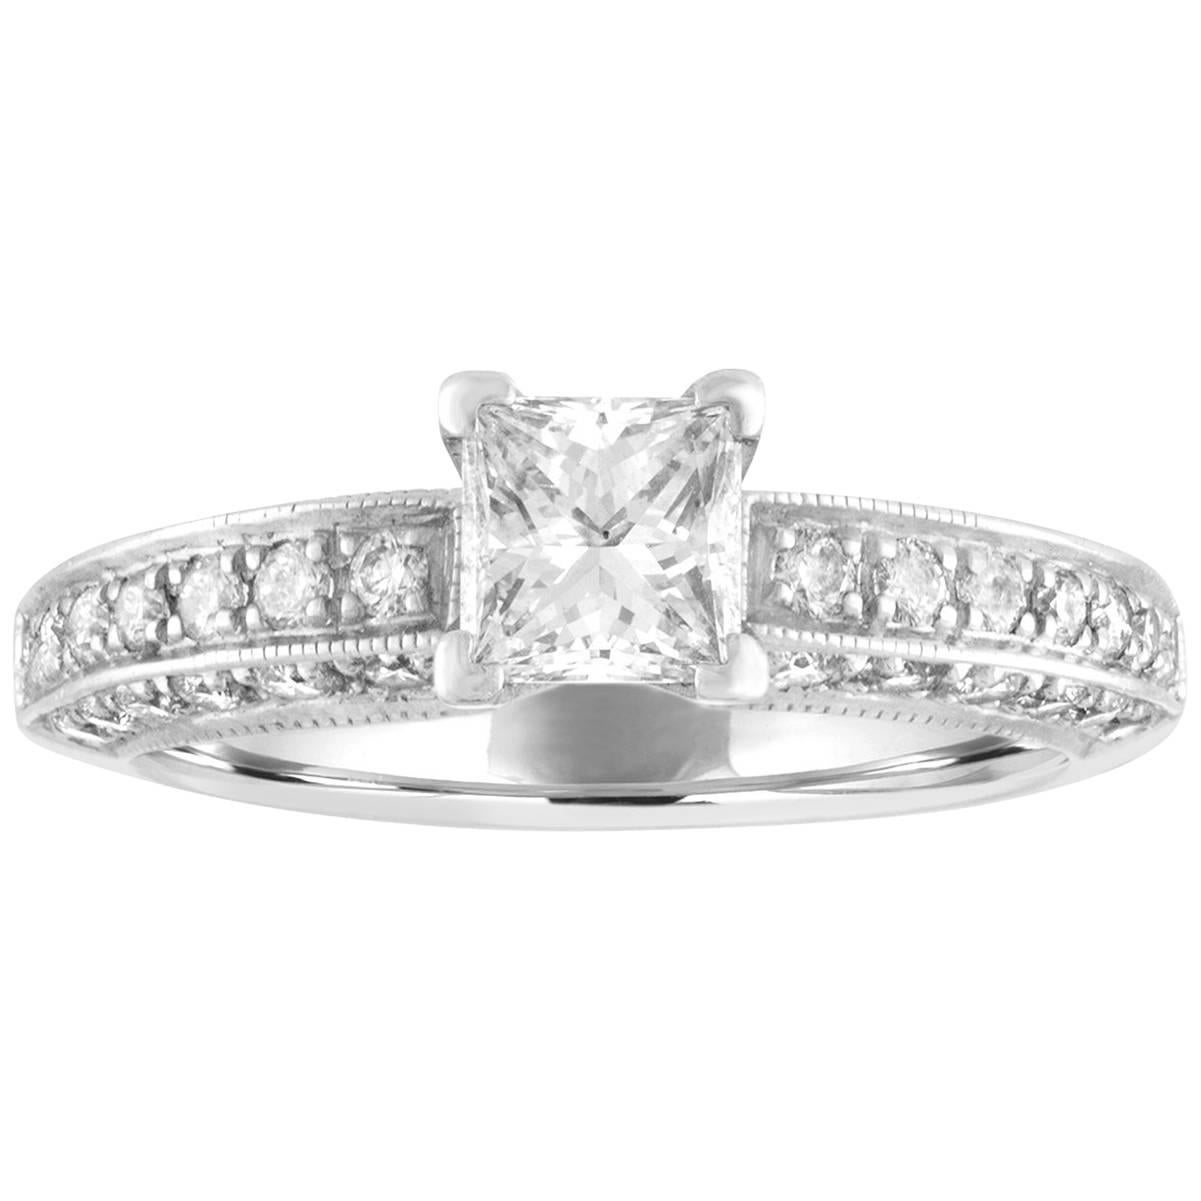 GIA Certified 0.71 Carat E VVS2 Diamond Platinum Gold Engagement Ring